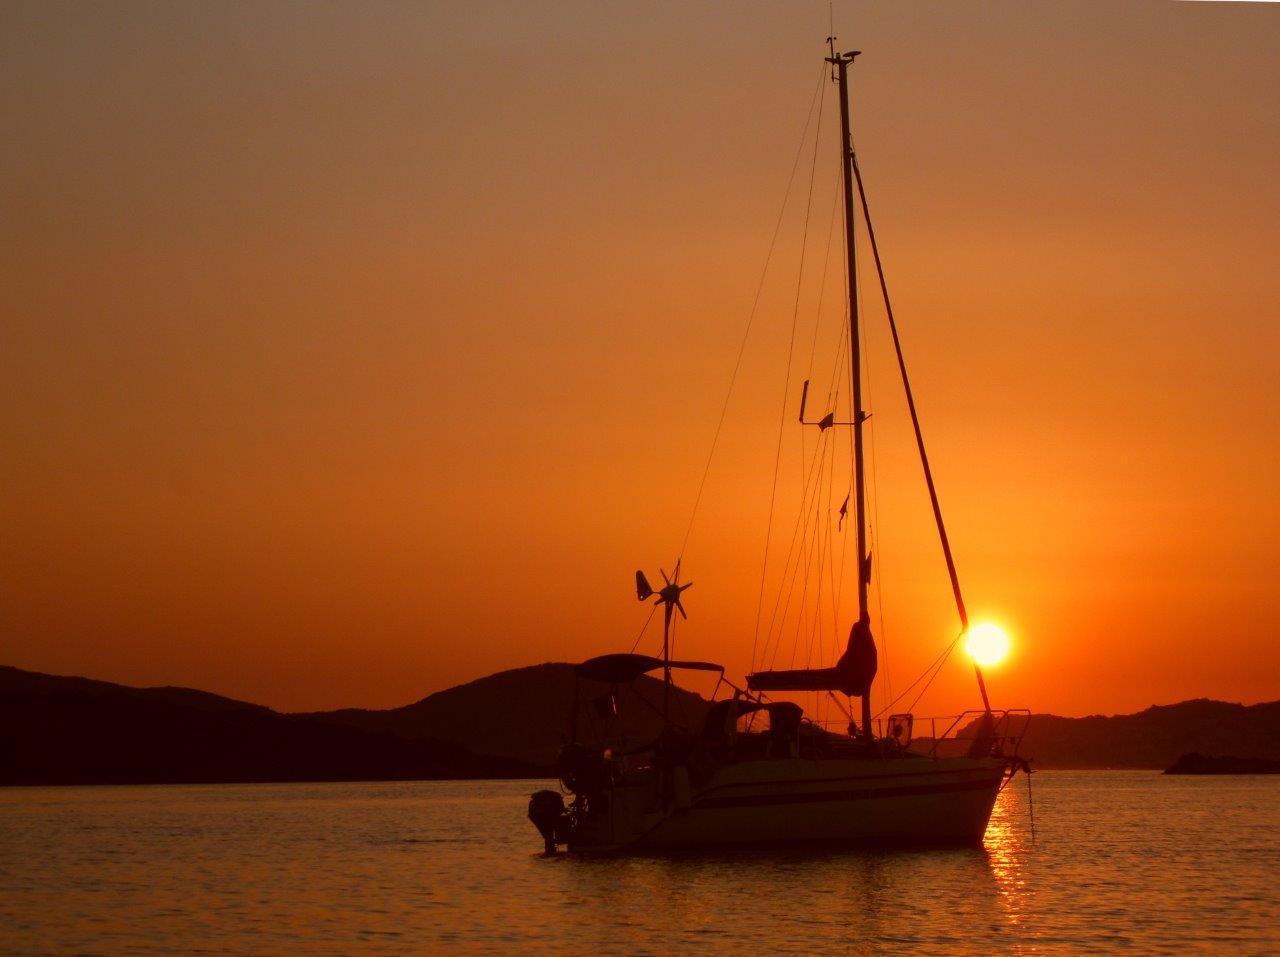 sunset sailing boats rocks - photo #14